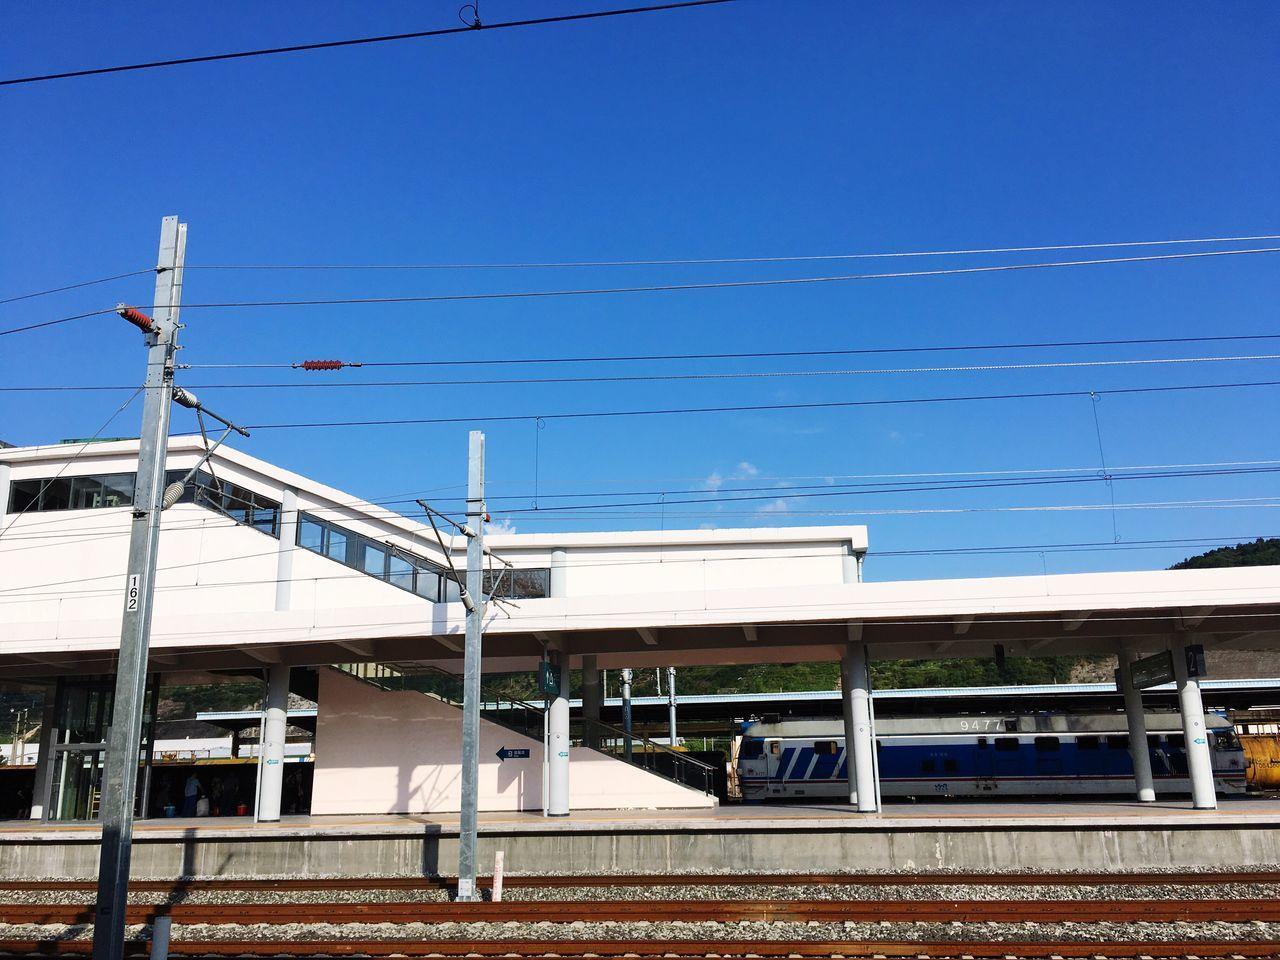 Lishui Train Station